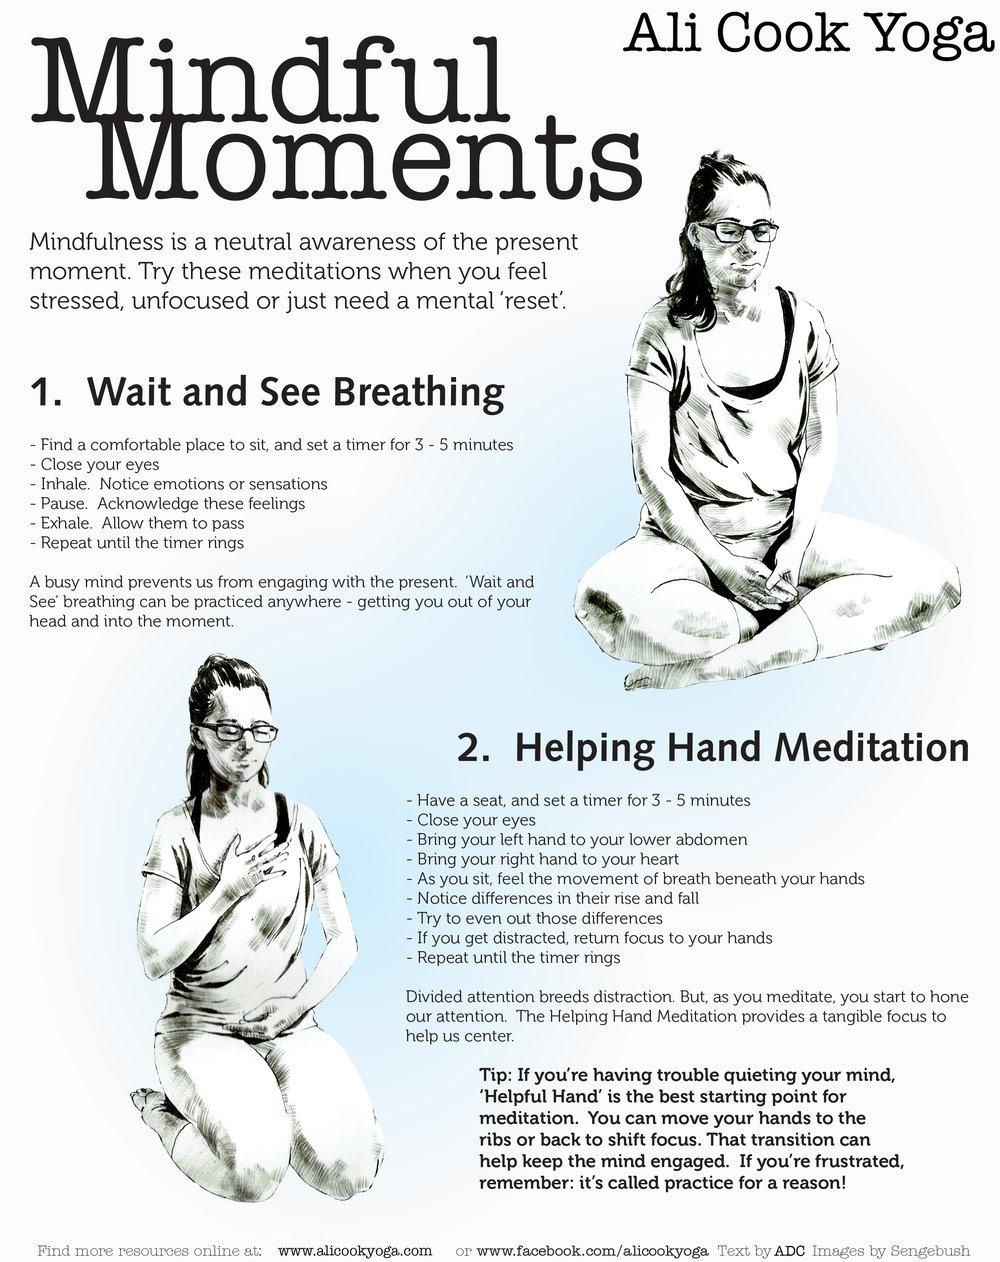 Ali Cook Yoga Practice Guide.jpg